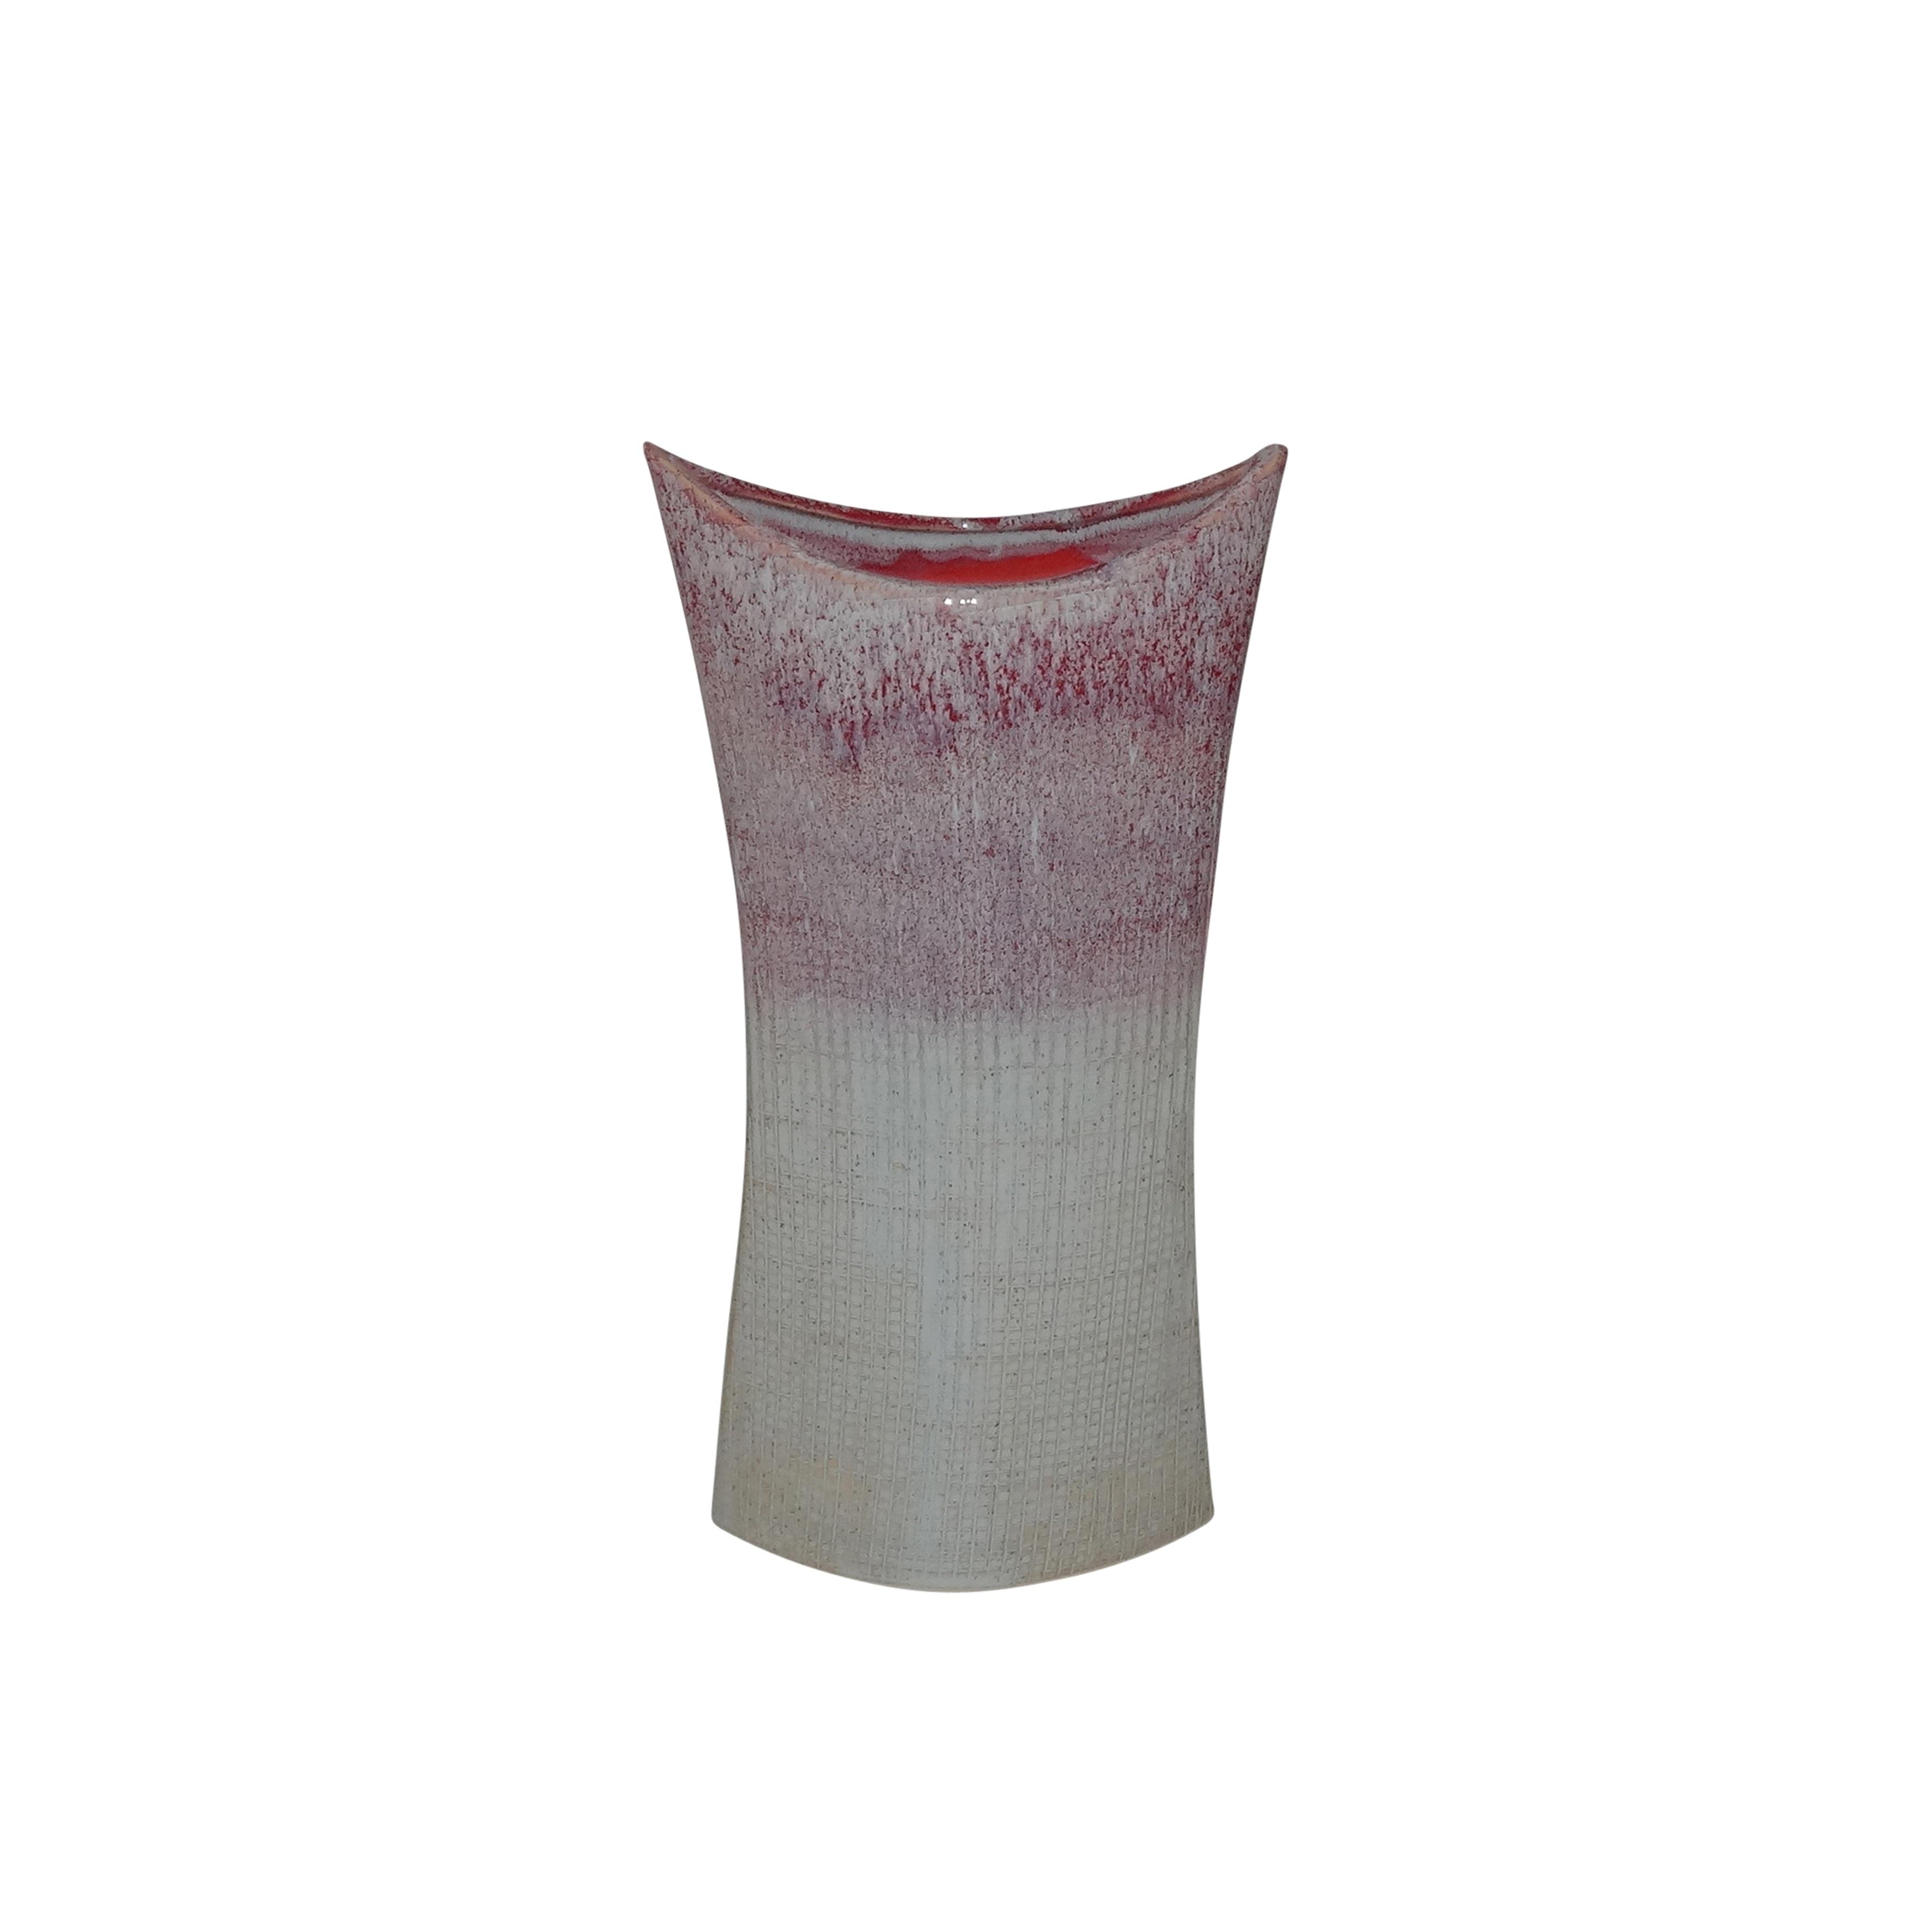 Small Size Decorative Ceramic Vase in Mermaids Purse Shape, Purple